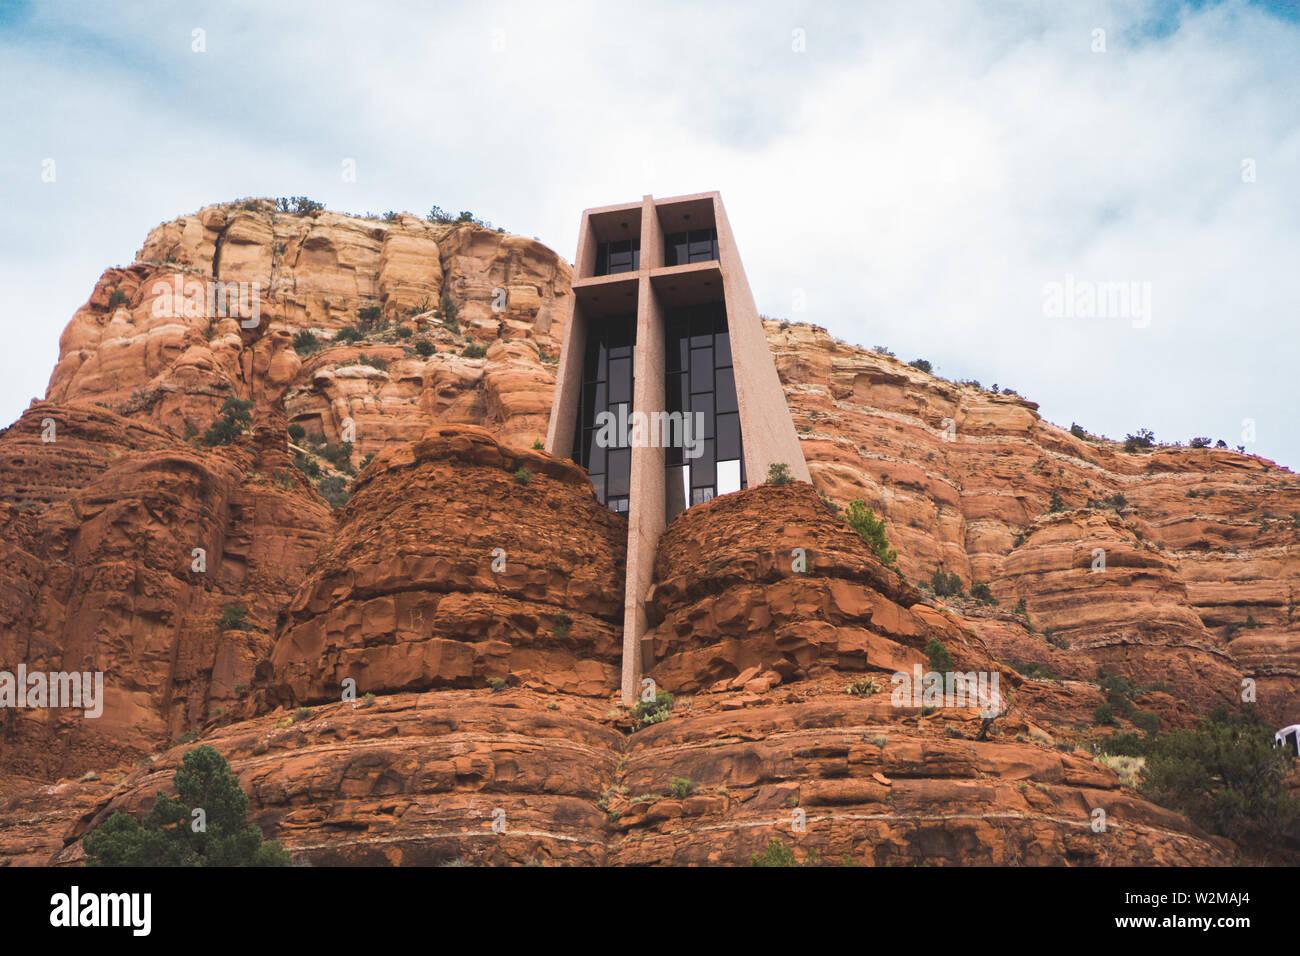 Chapel found upon hiking trail in Sedona, Arizona - Stock Image